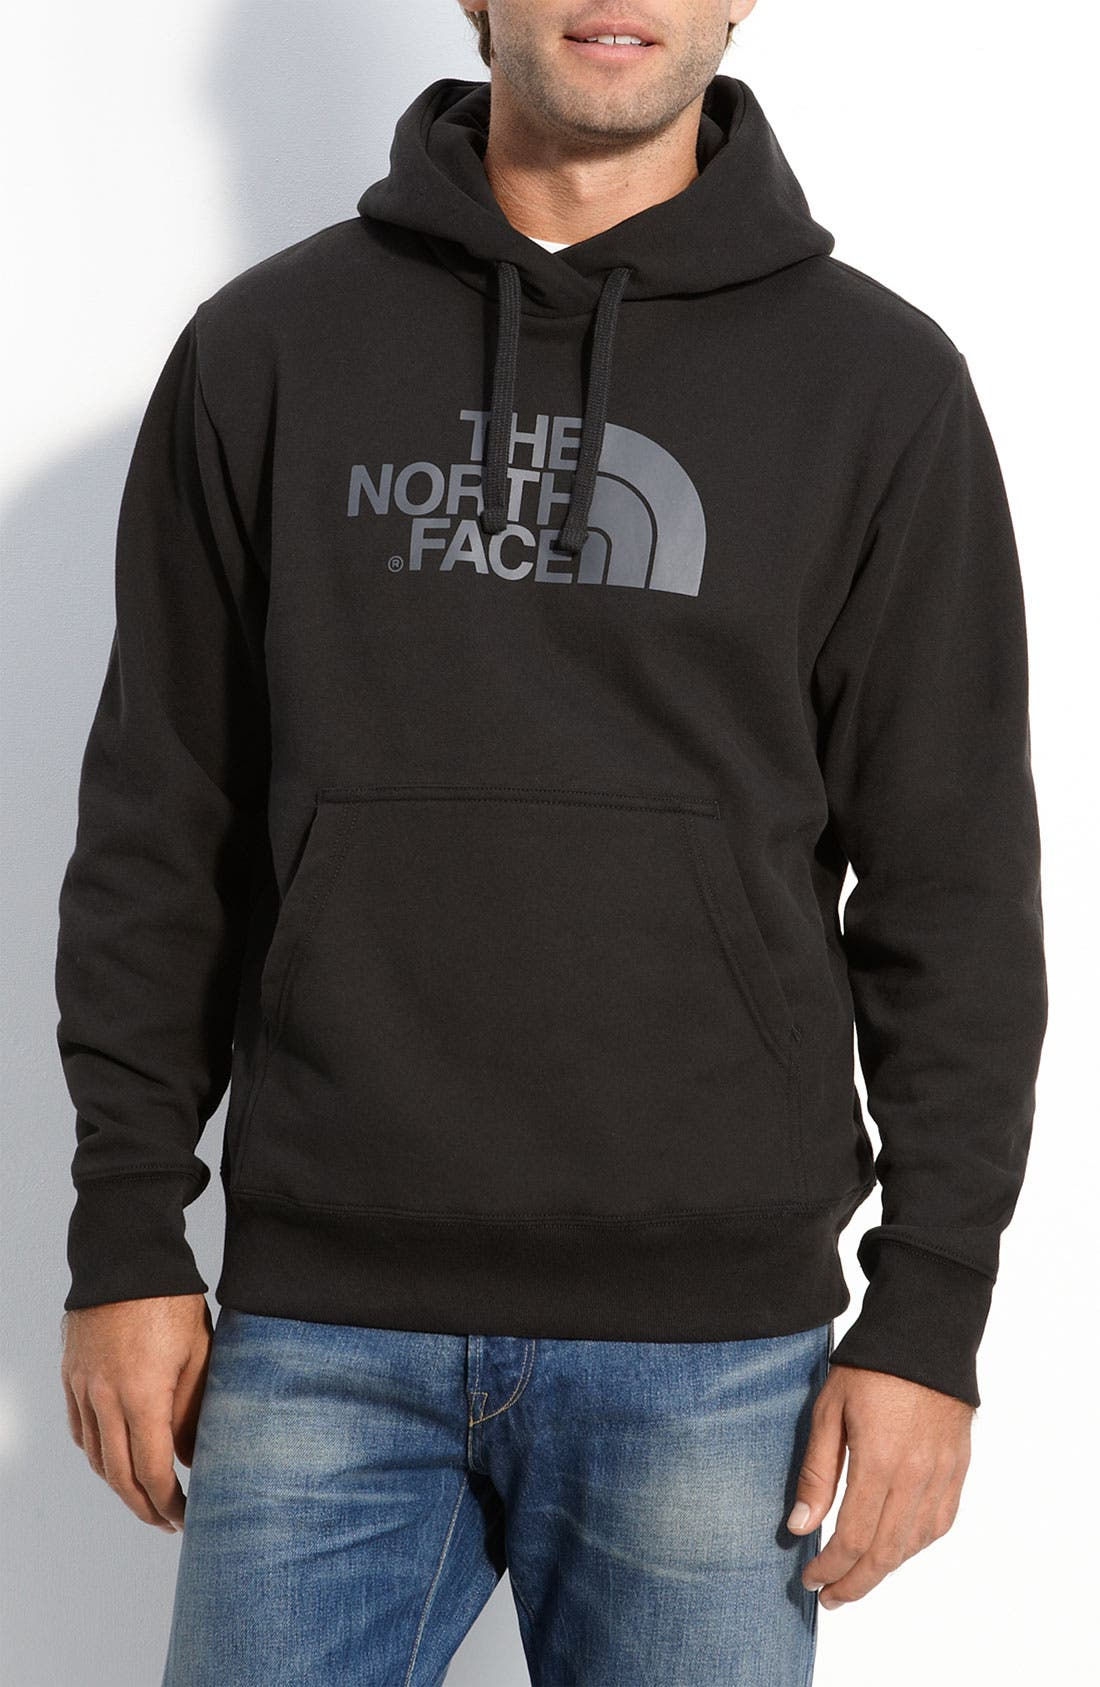 Main Image - The North Face 'Half Dome' Hooded Sweatshirt